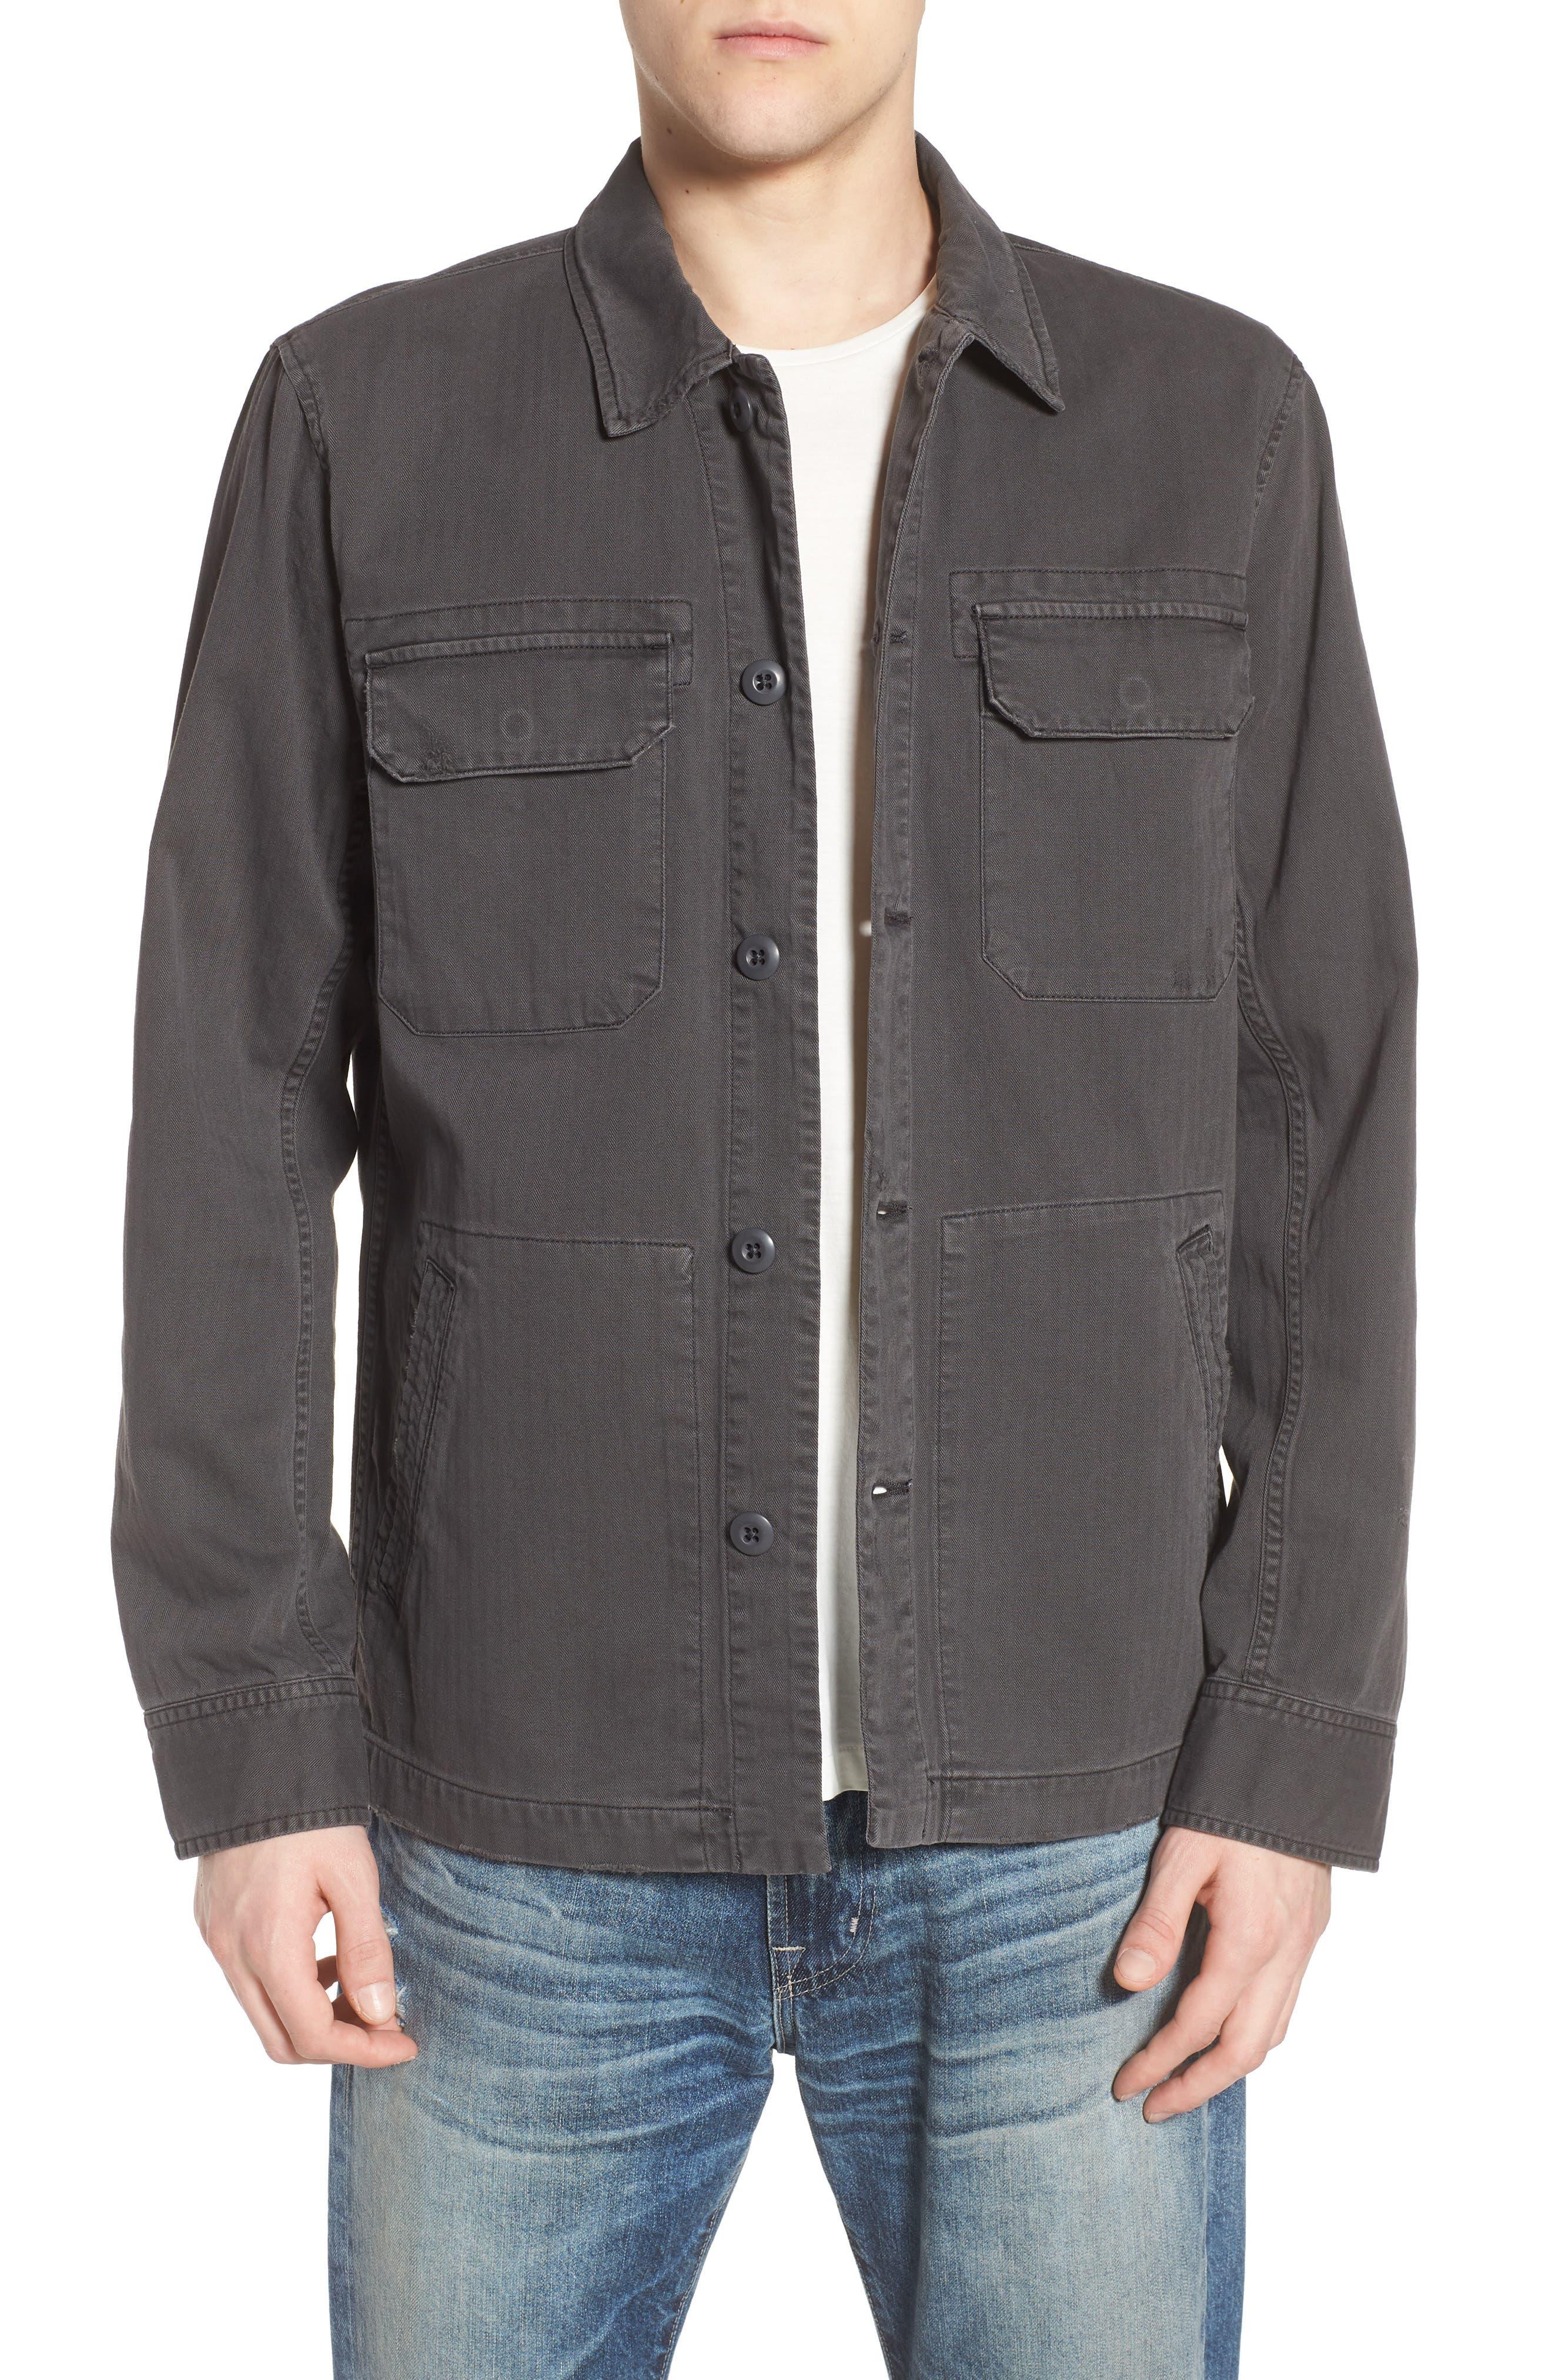 Marx Slim Fit Jacket,                             Main thumbnail 1, color,                             5 Years Pigment Smoke Grey